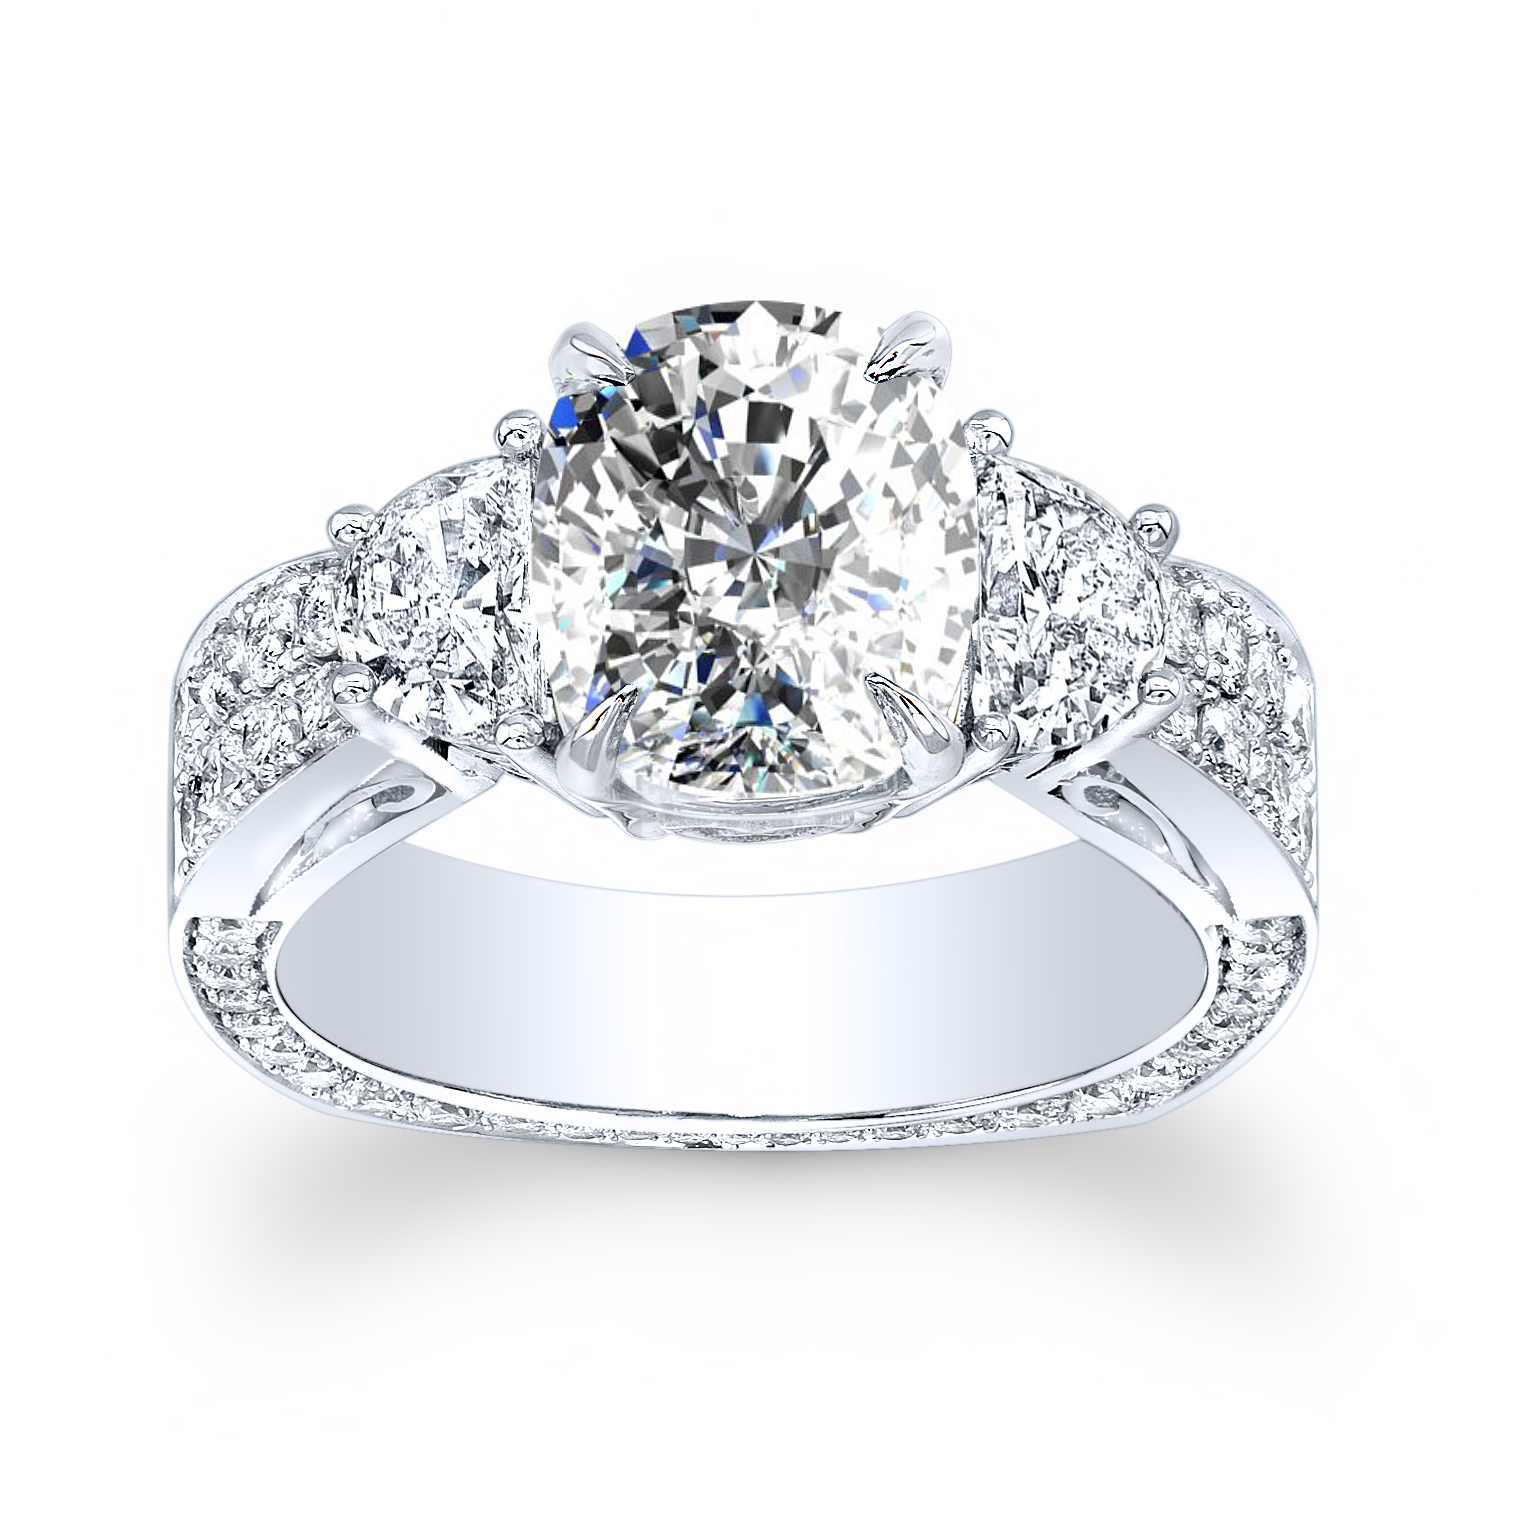 3-Stone Pave Side Profile Art Deco w/ Half-Moon Sidestones Diamond Ring